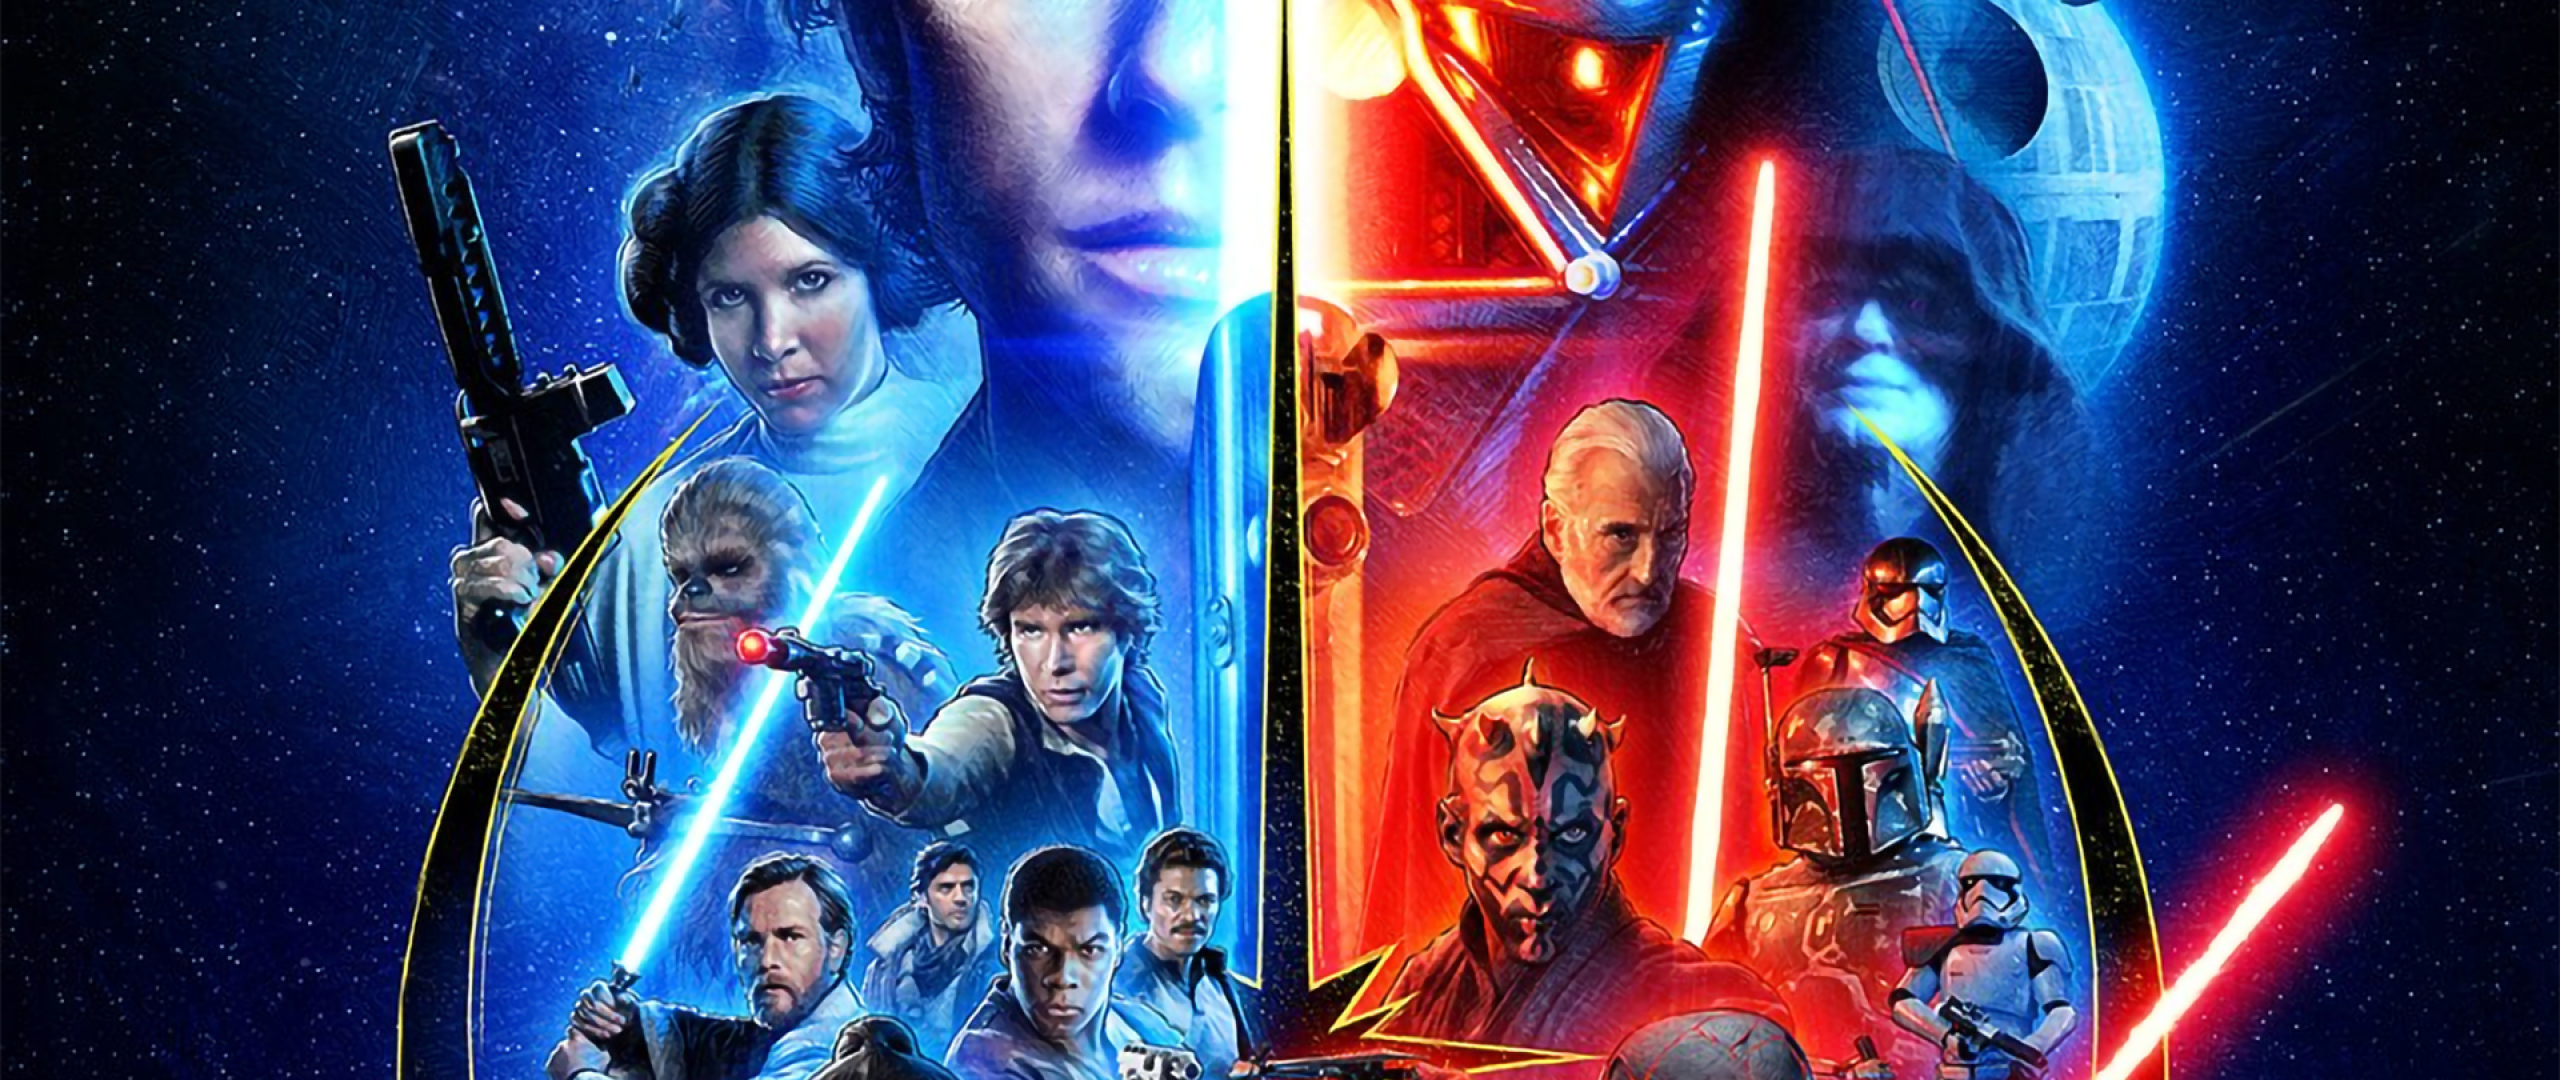 2560x1080 star wars skywalker saga 2560x1080 resolution